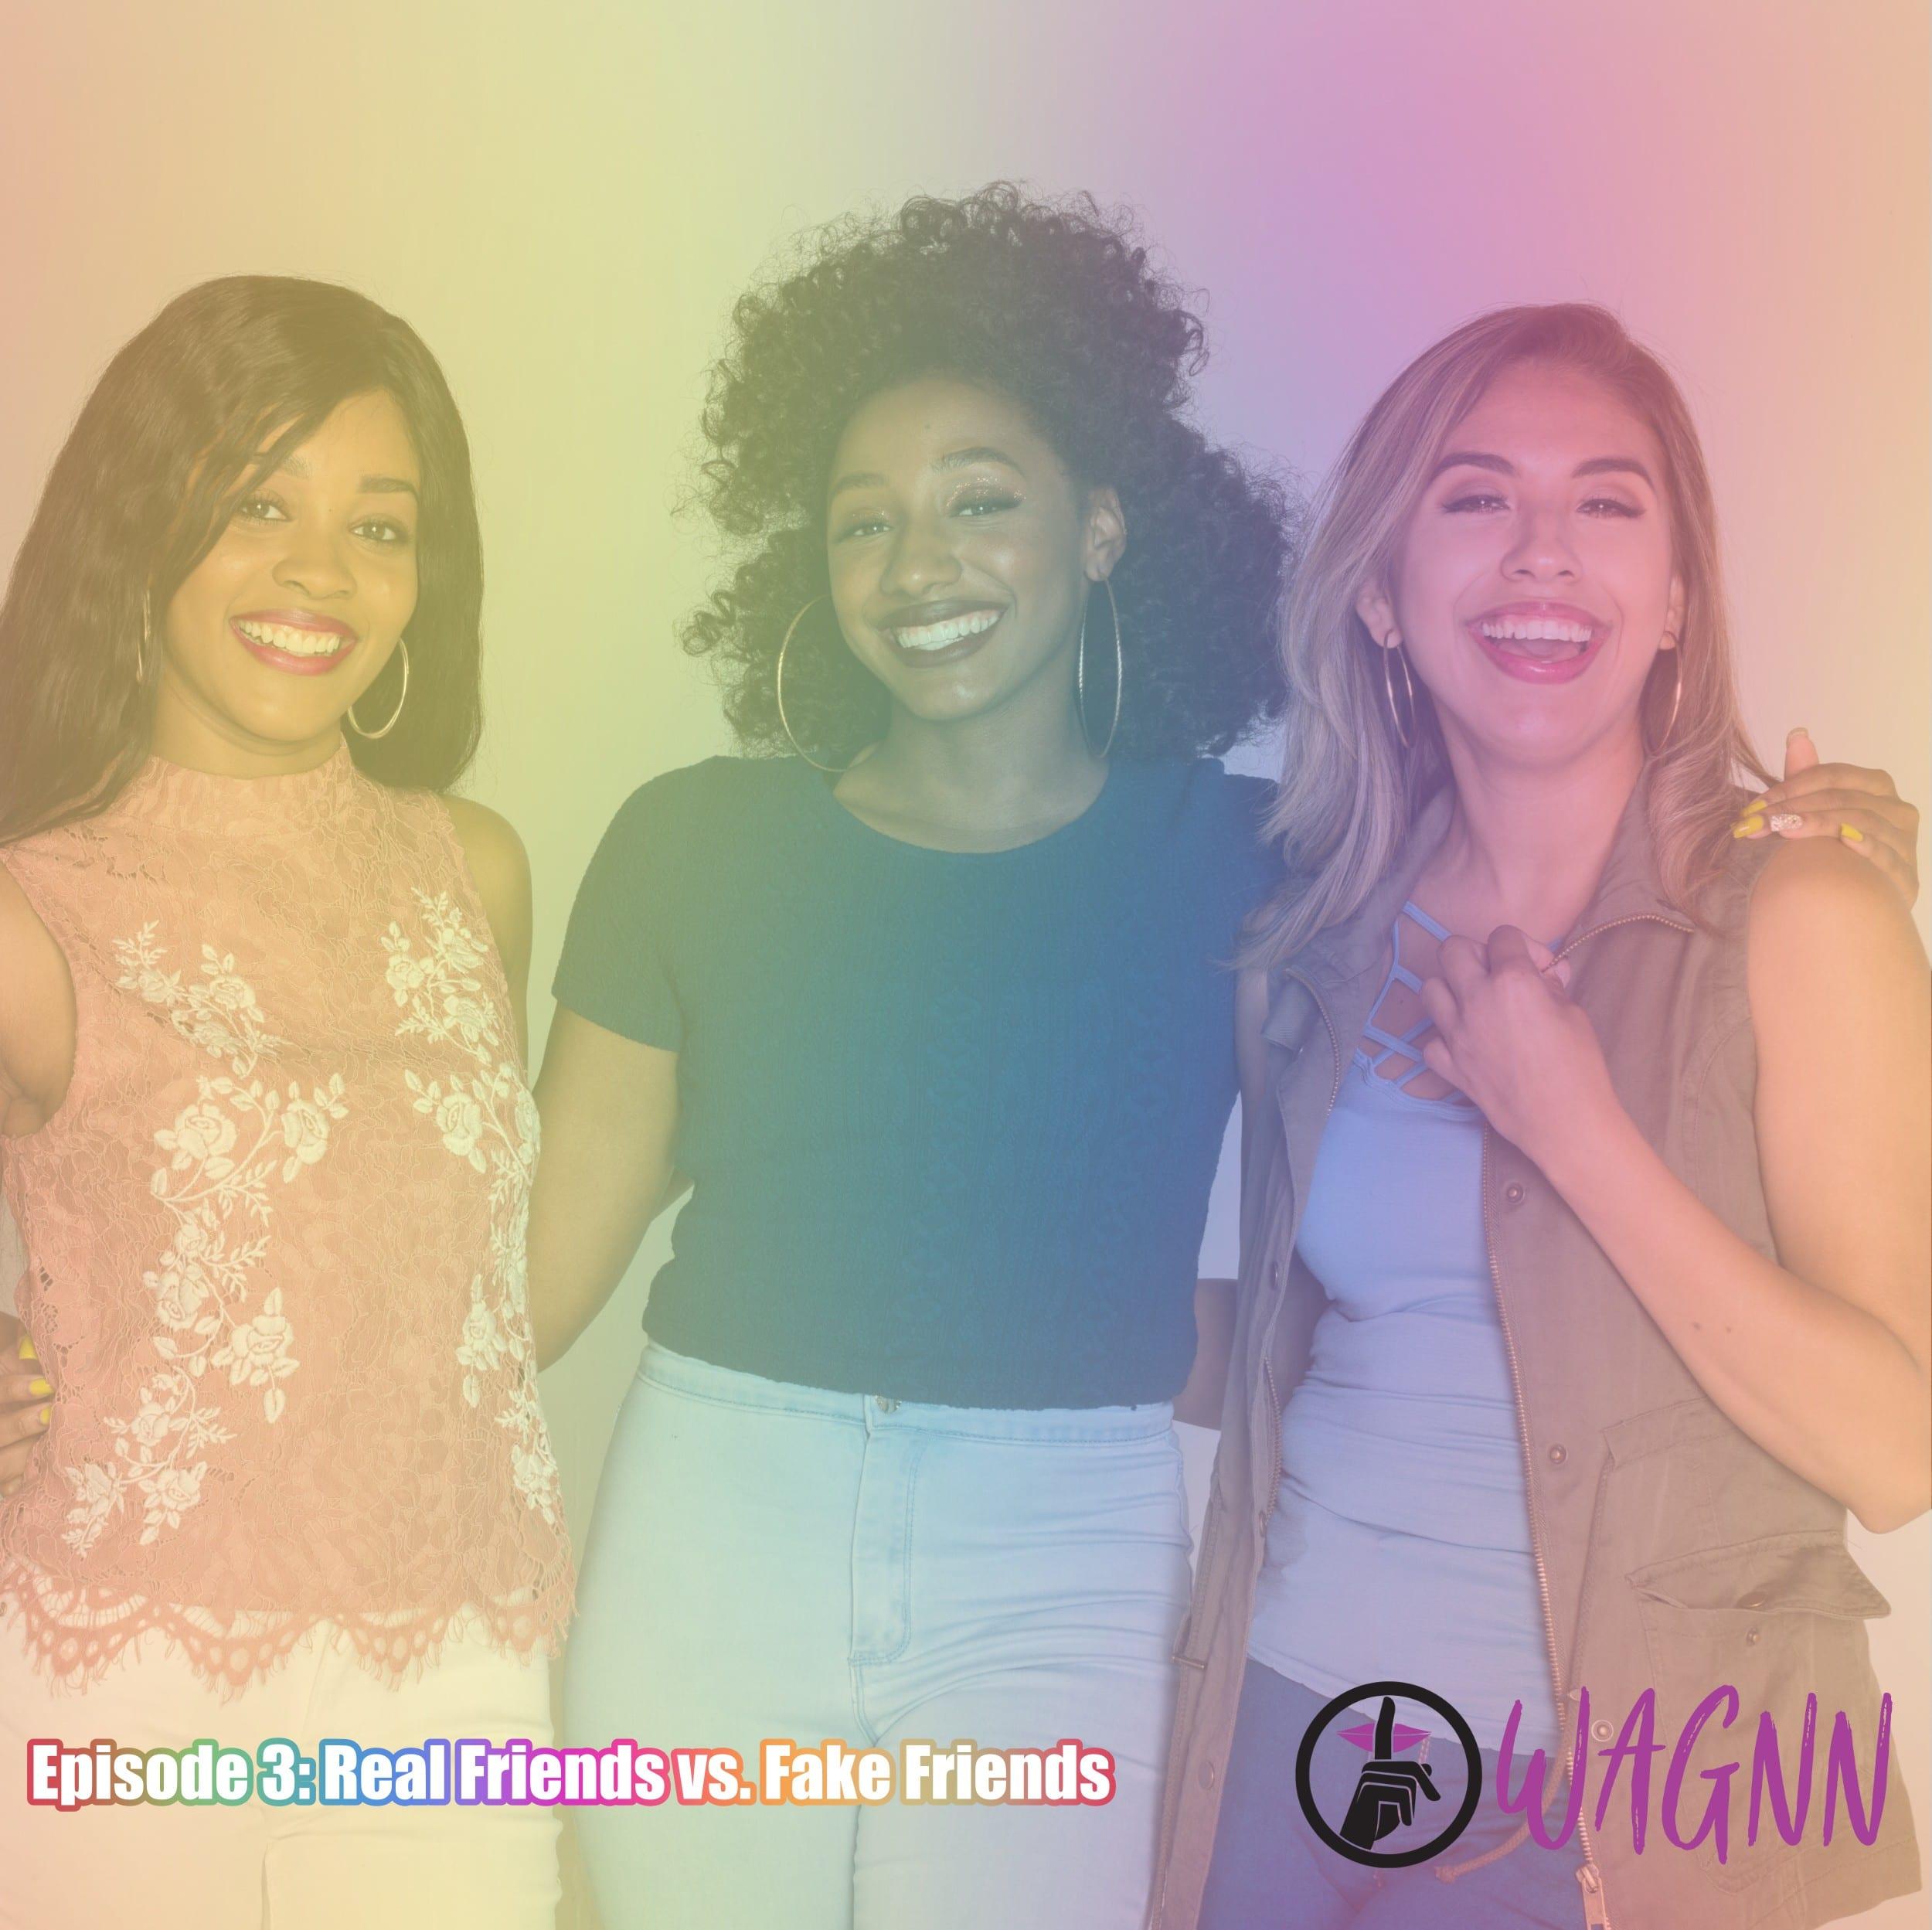 Episode 3: Real Friends vs. Fake Friends